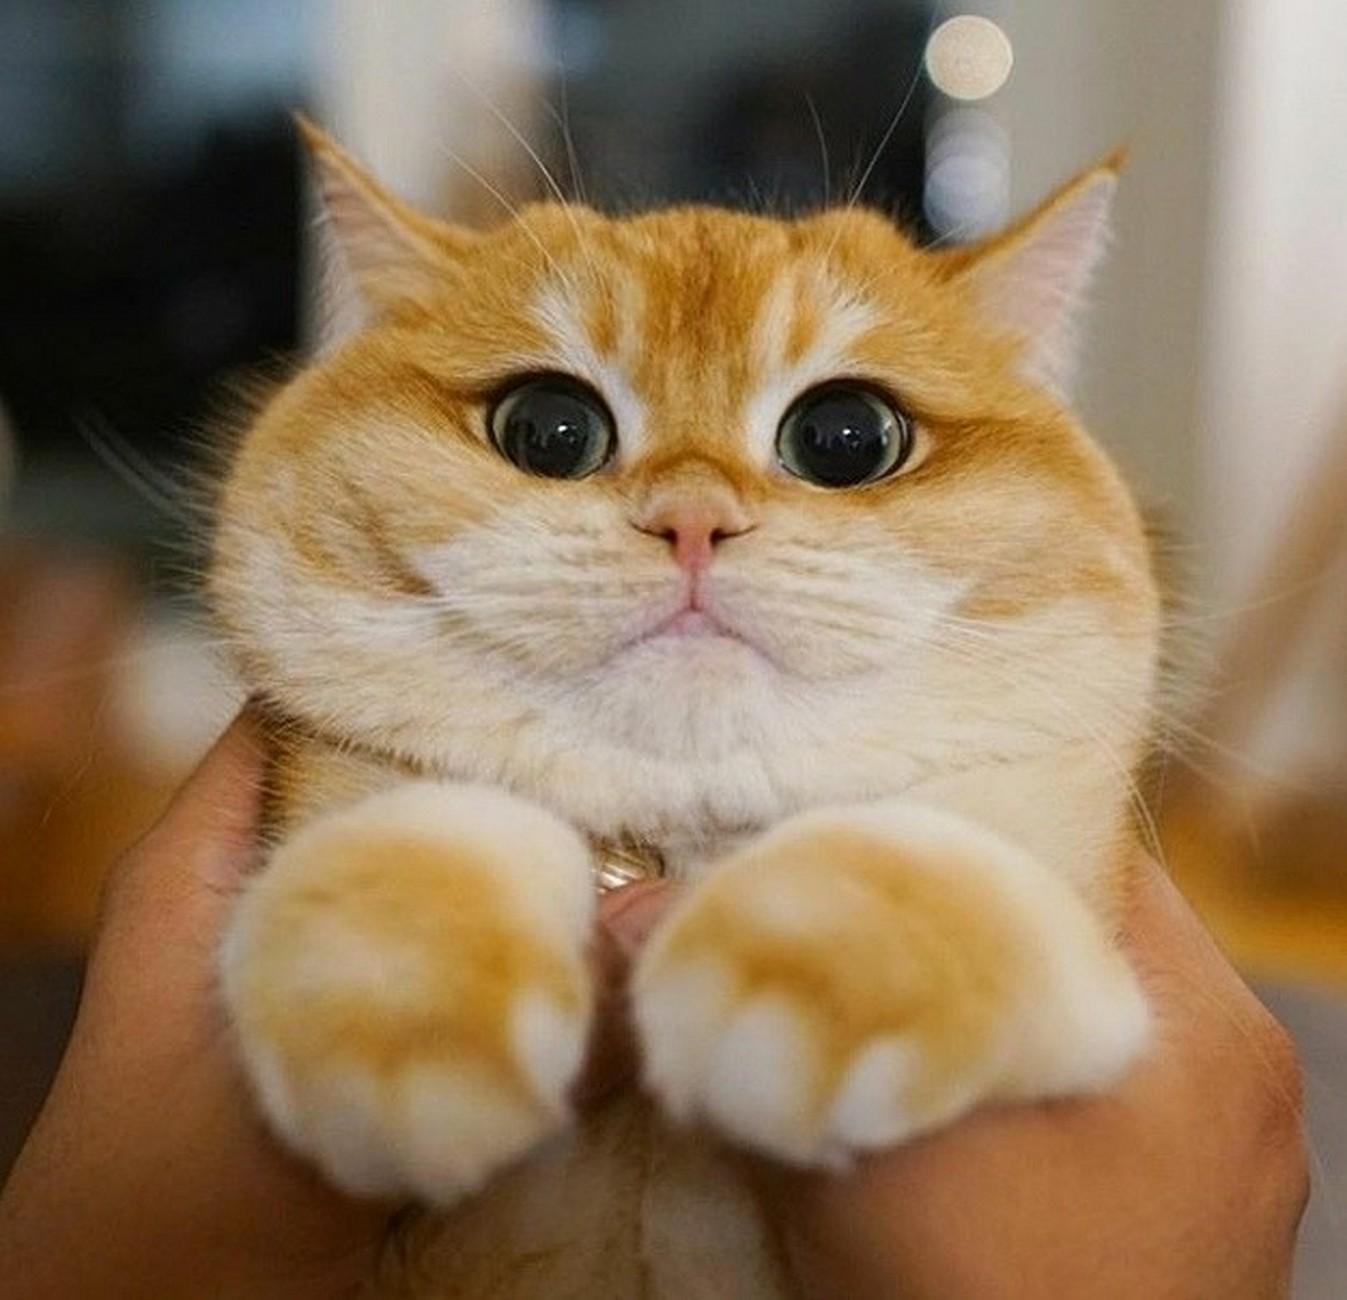 Handsome cat looks good